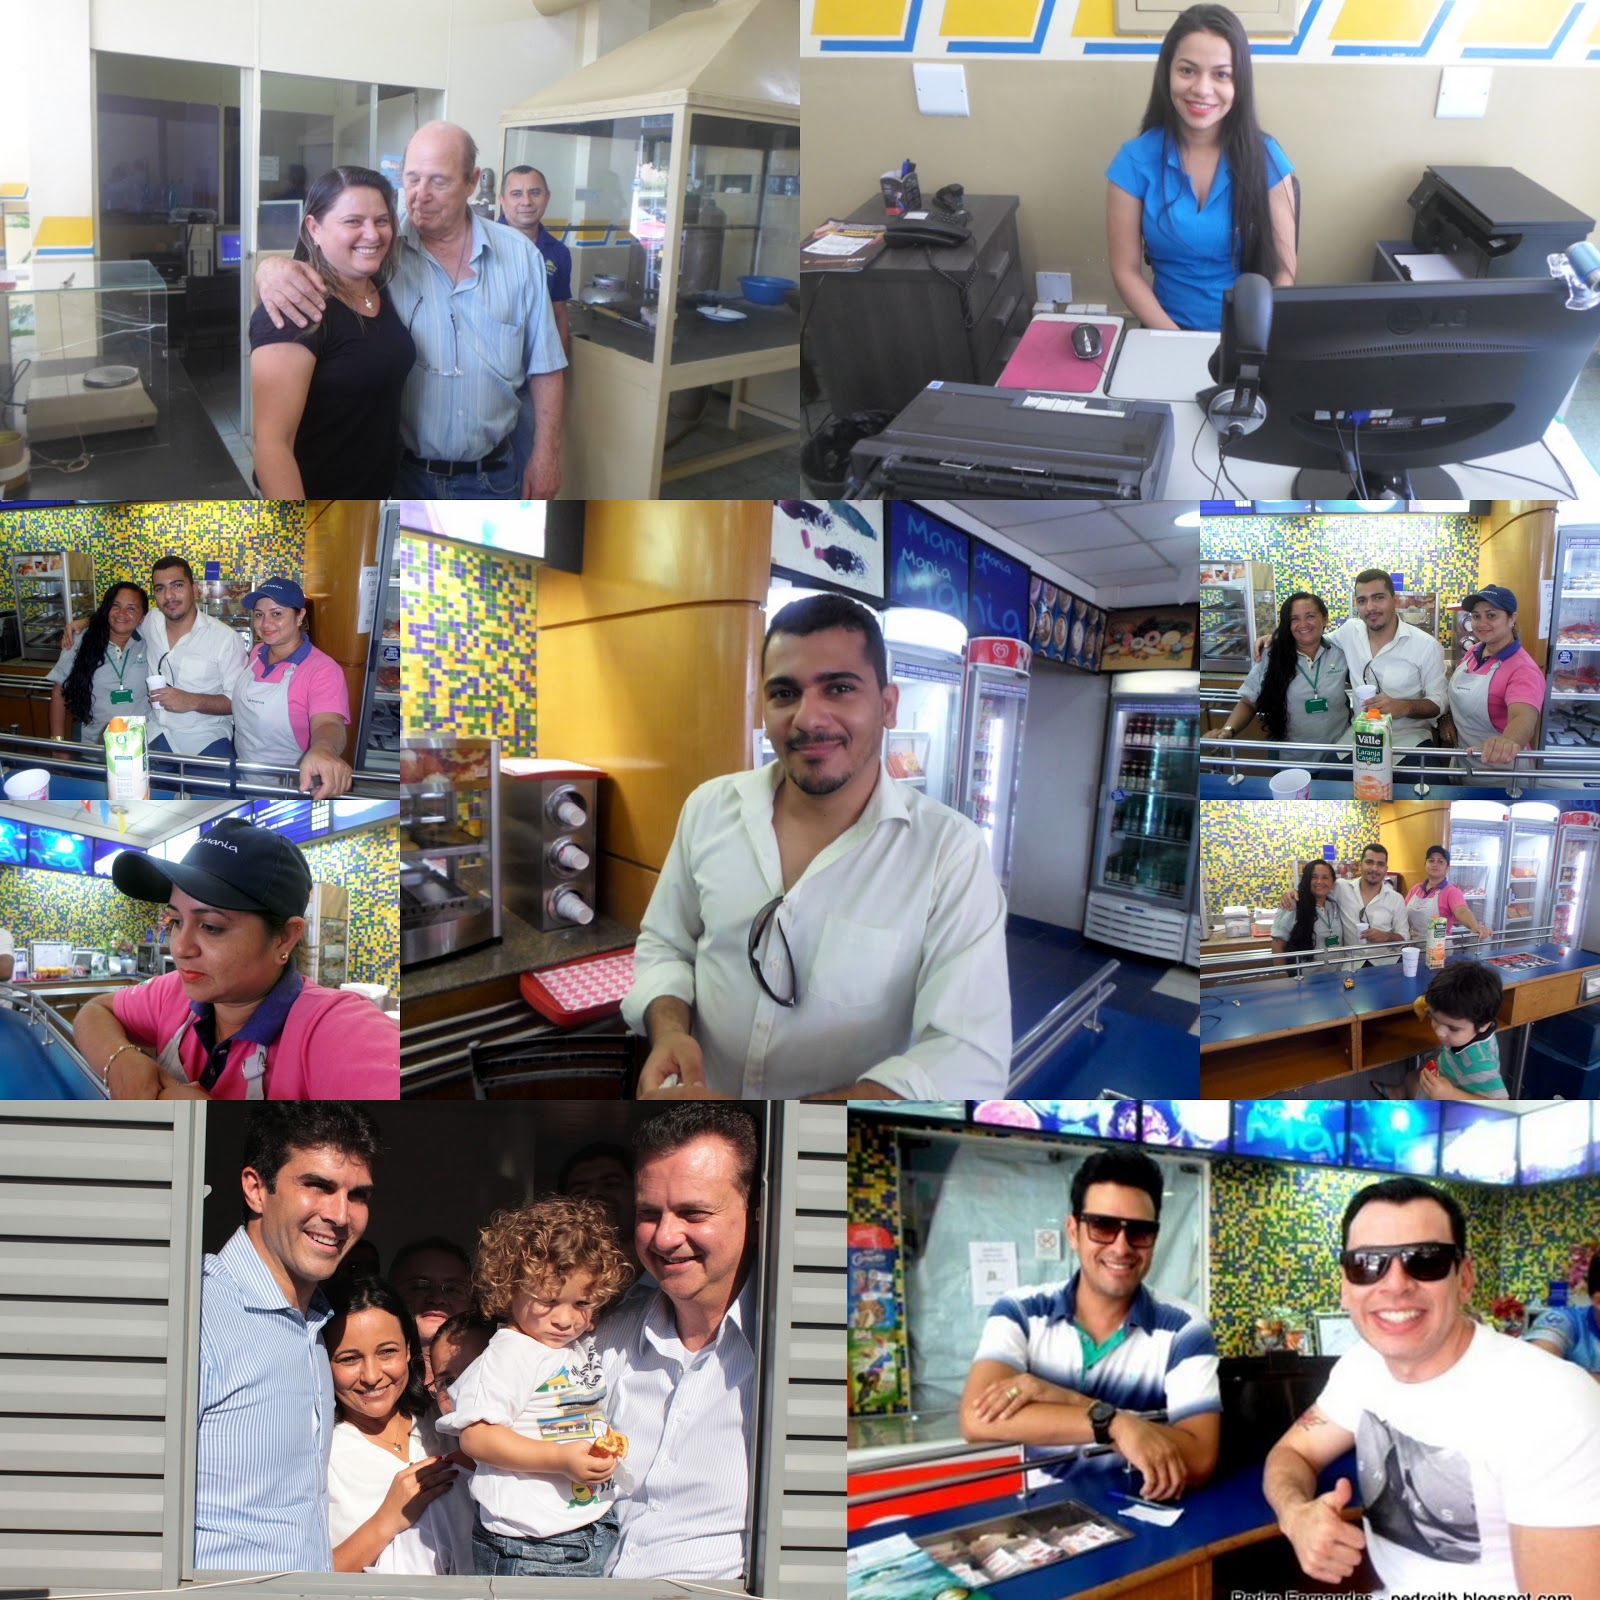 http://pedroitb.blogspot.com.br/search/label/Fotos?&max-results=7